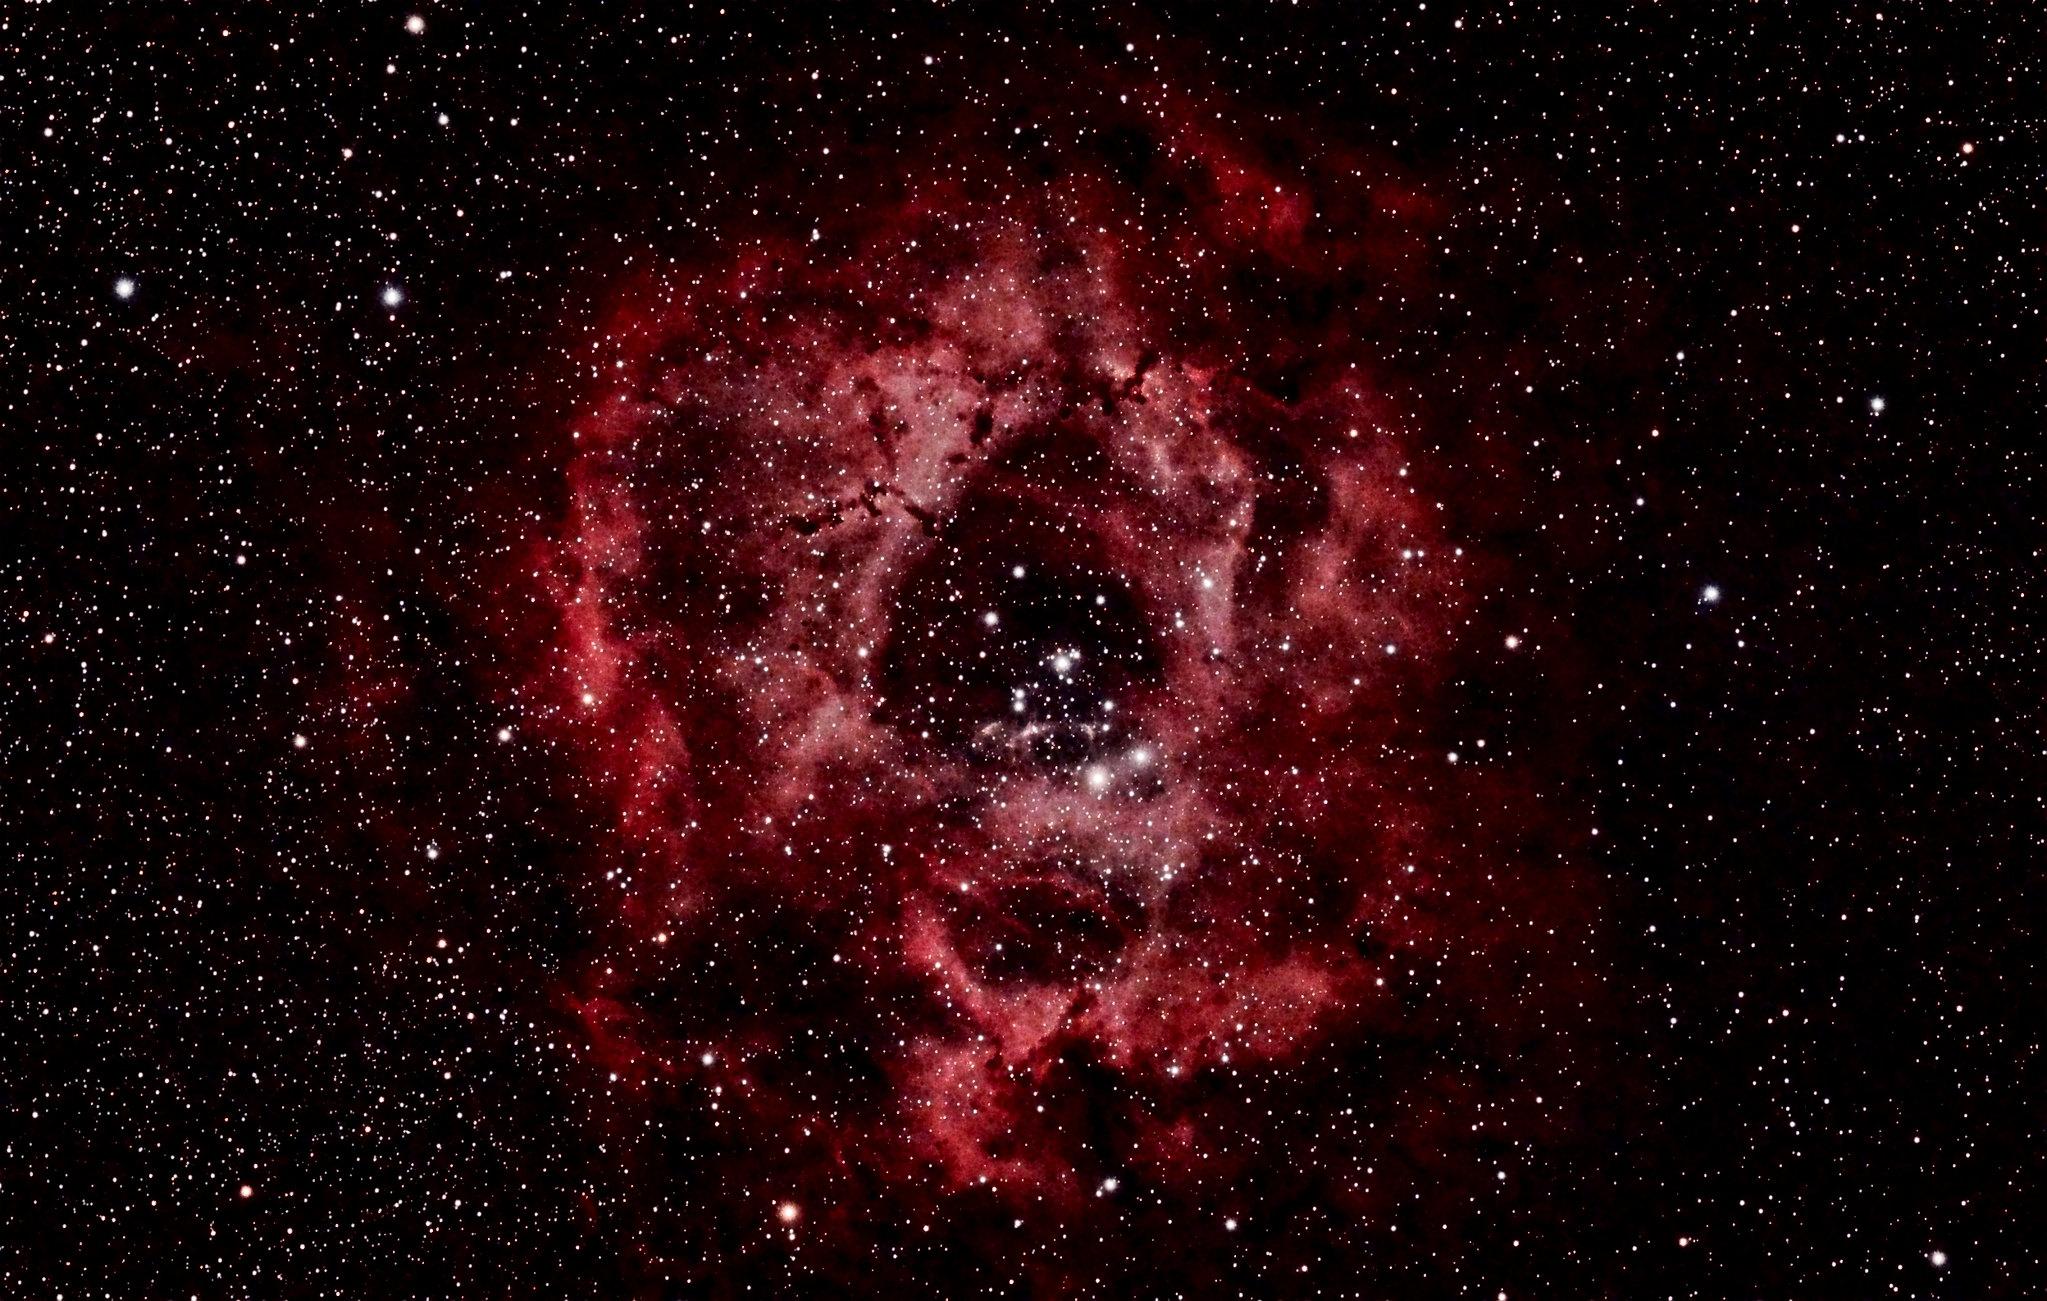 Rosette Nebula by Mike McGovern